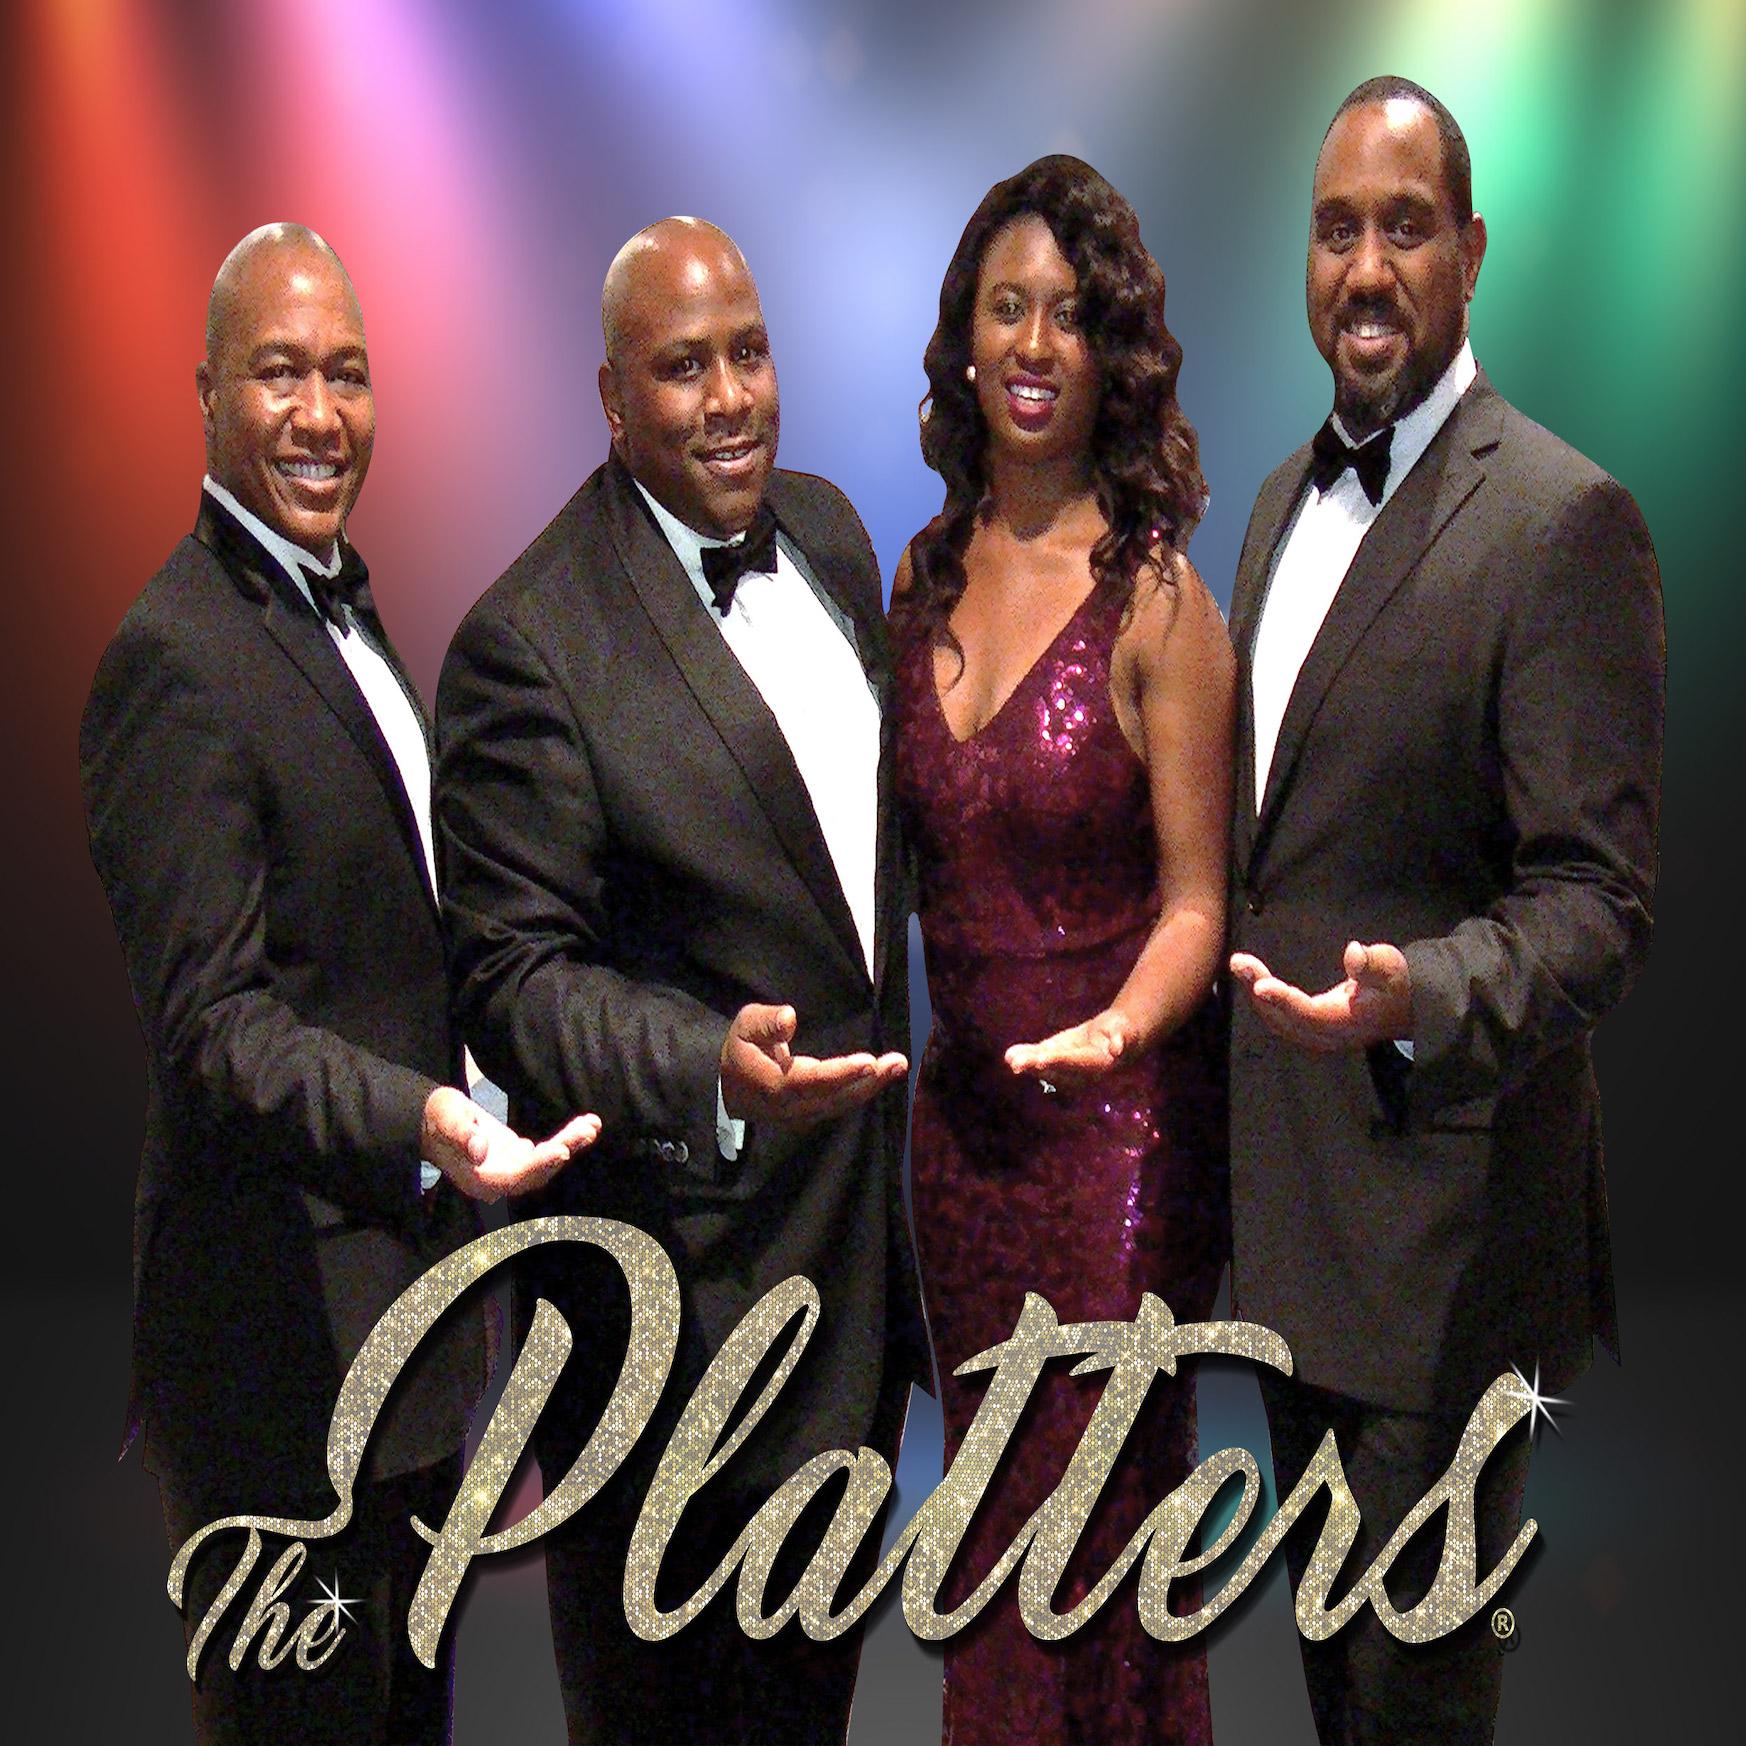 THE PLATTERS -R&B Legends -